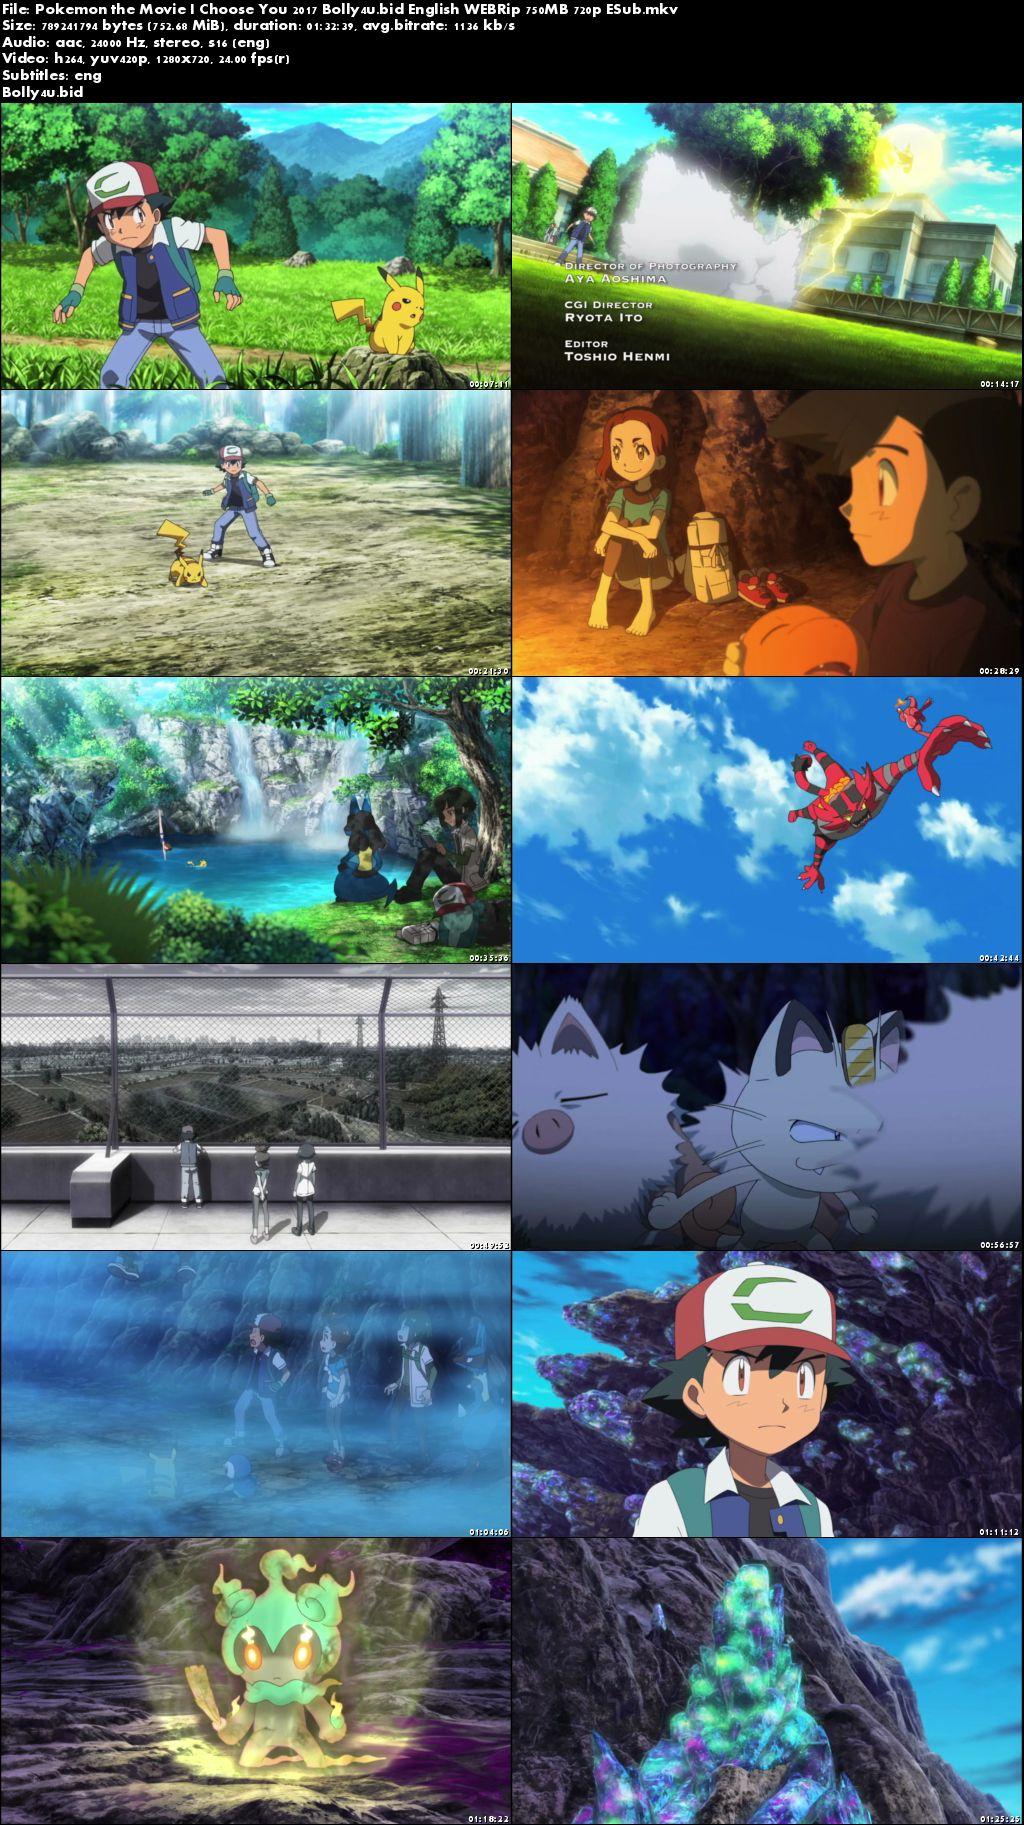 Pokemon the Movie I Choose You 2017 WEBRip 750MB English 720p ESub Download